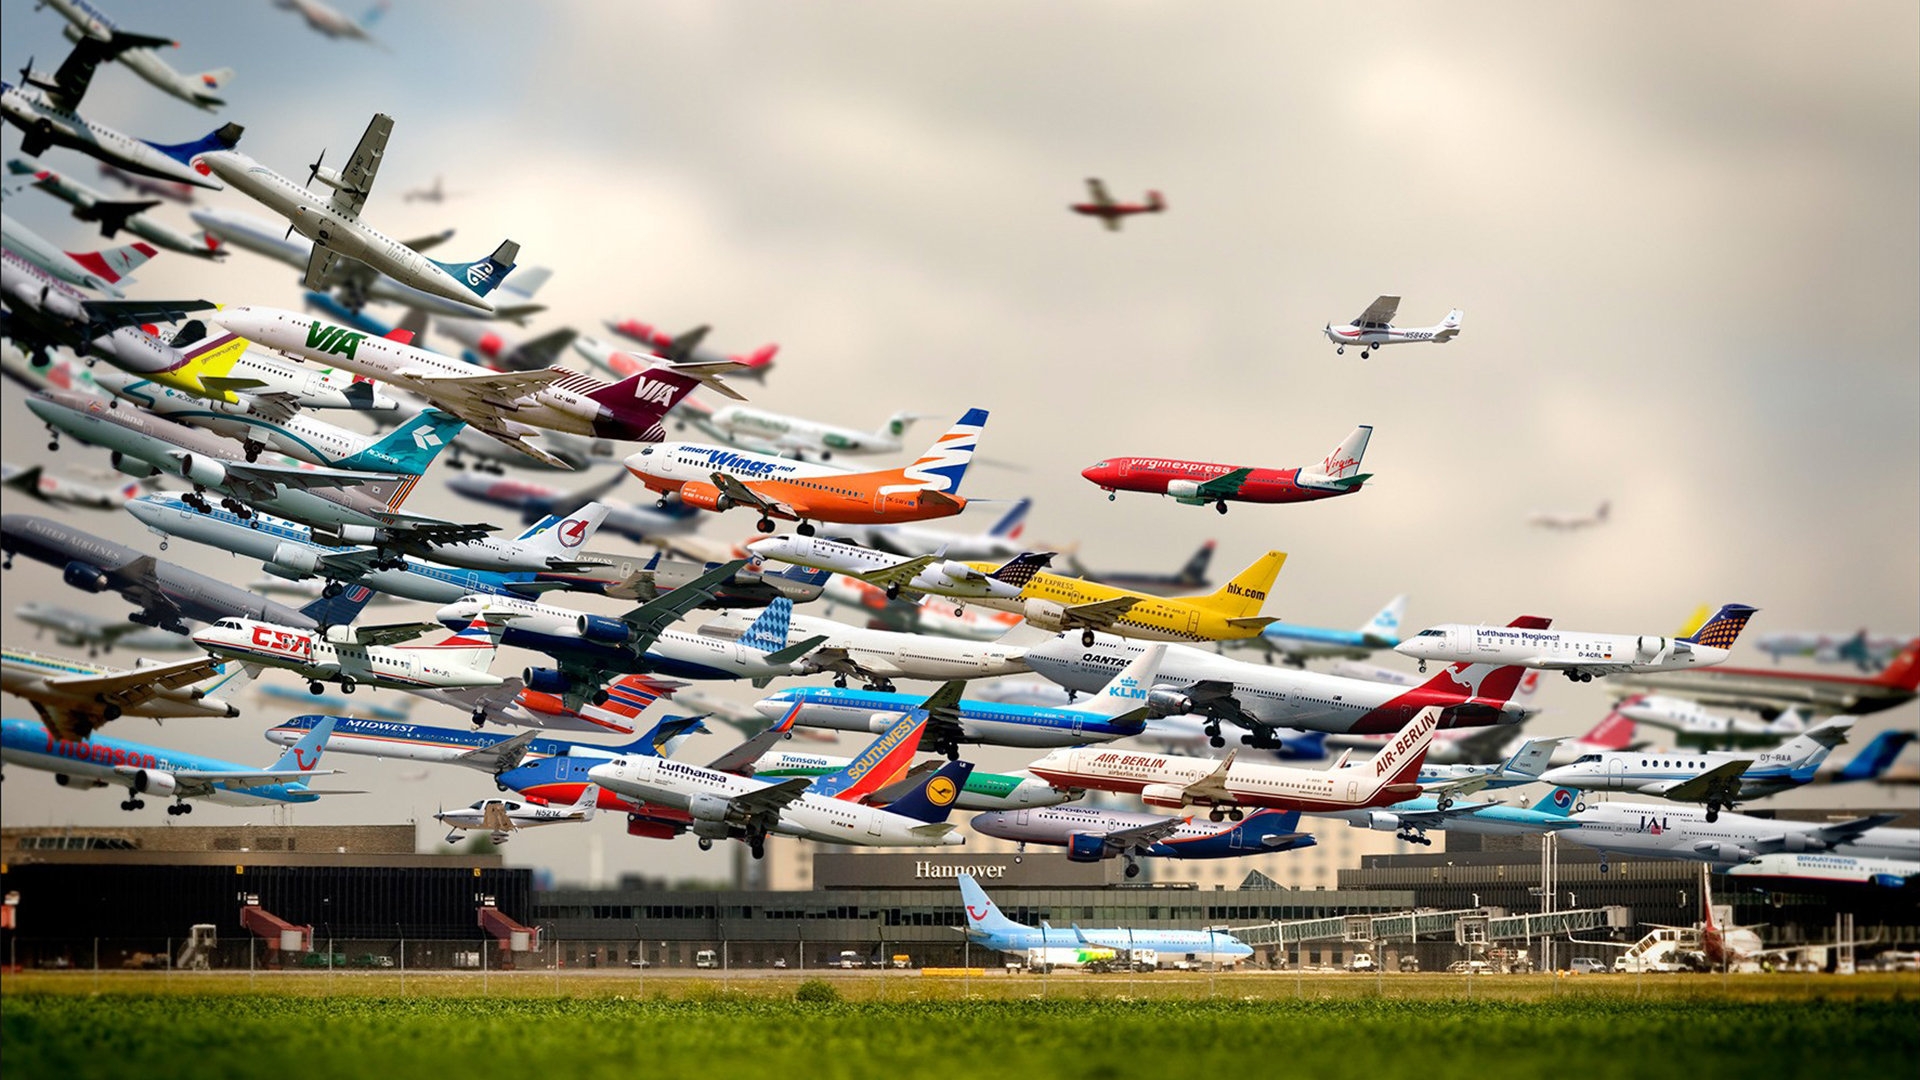 Aircraft Wallpaper HD